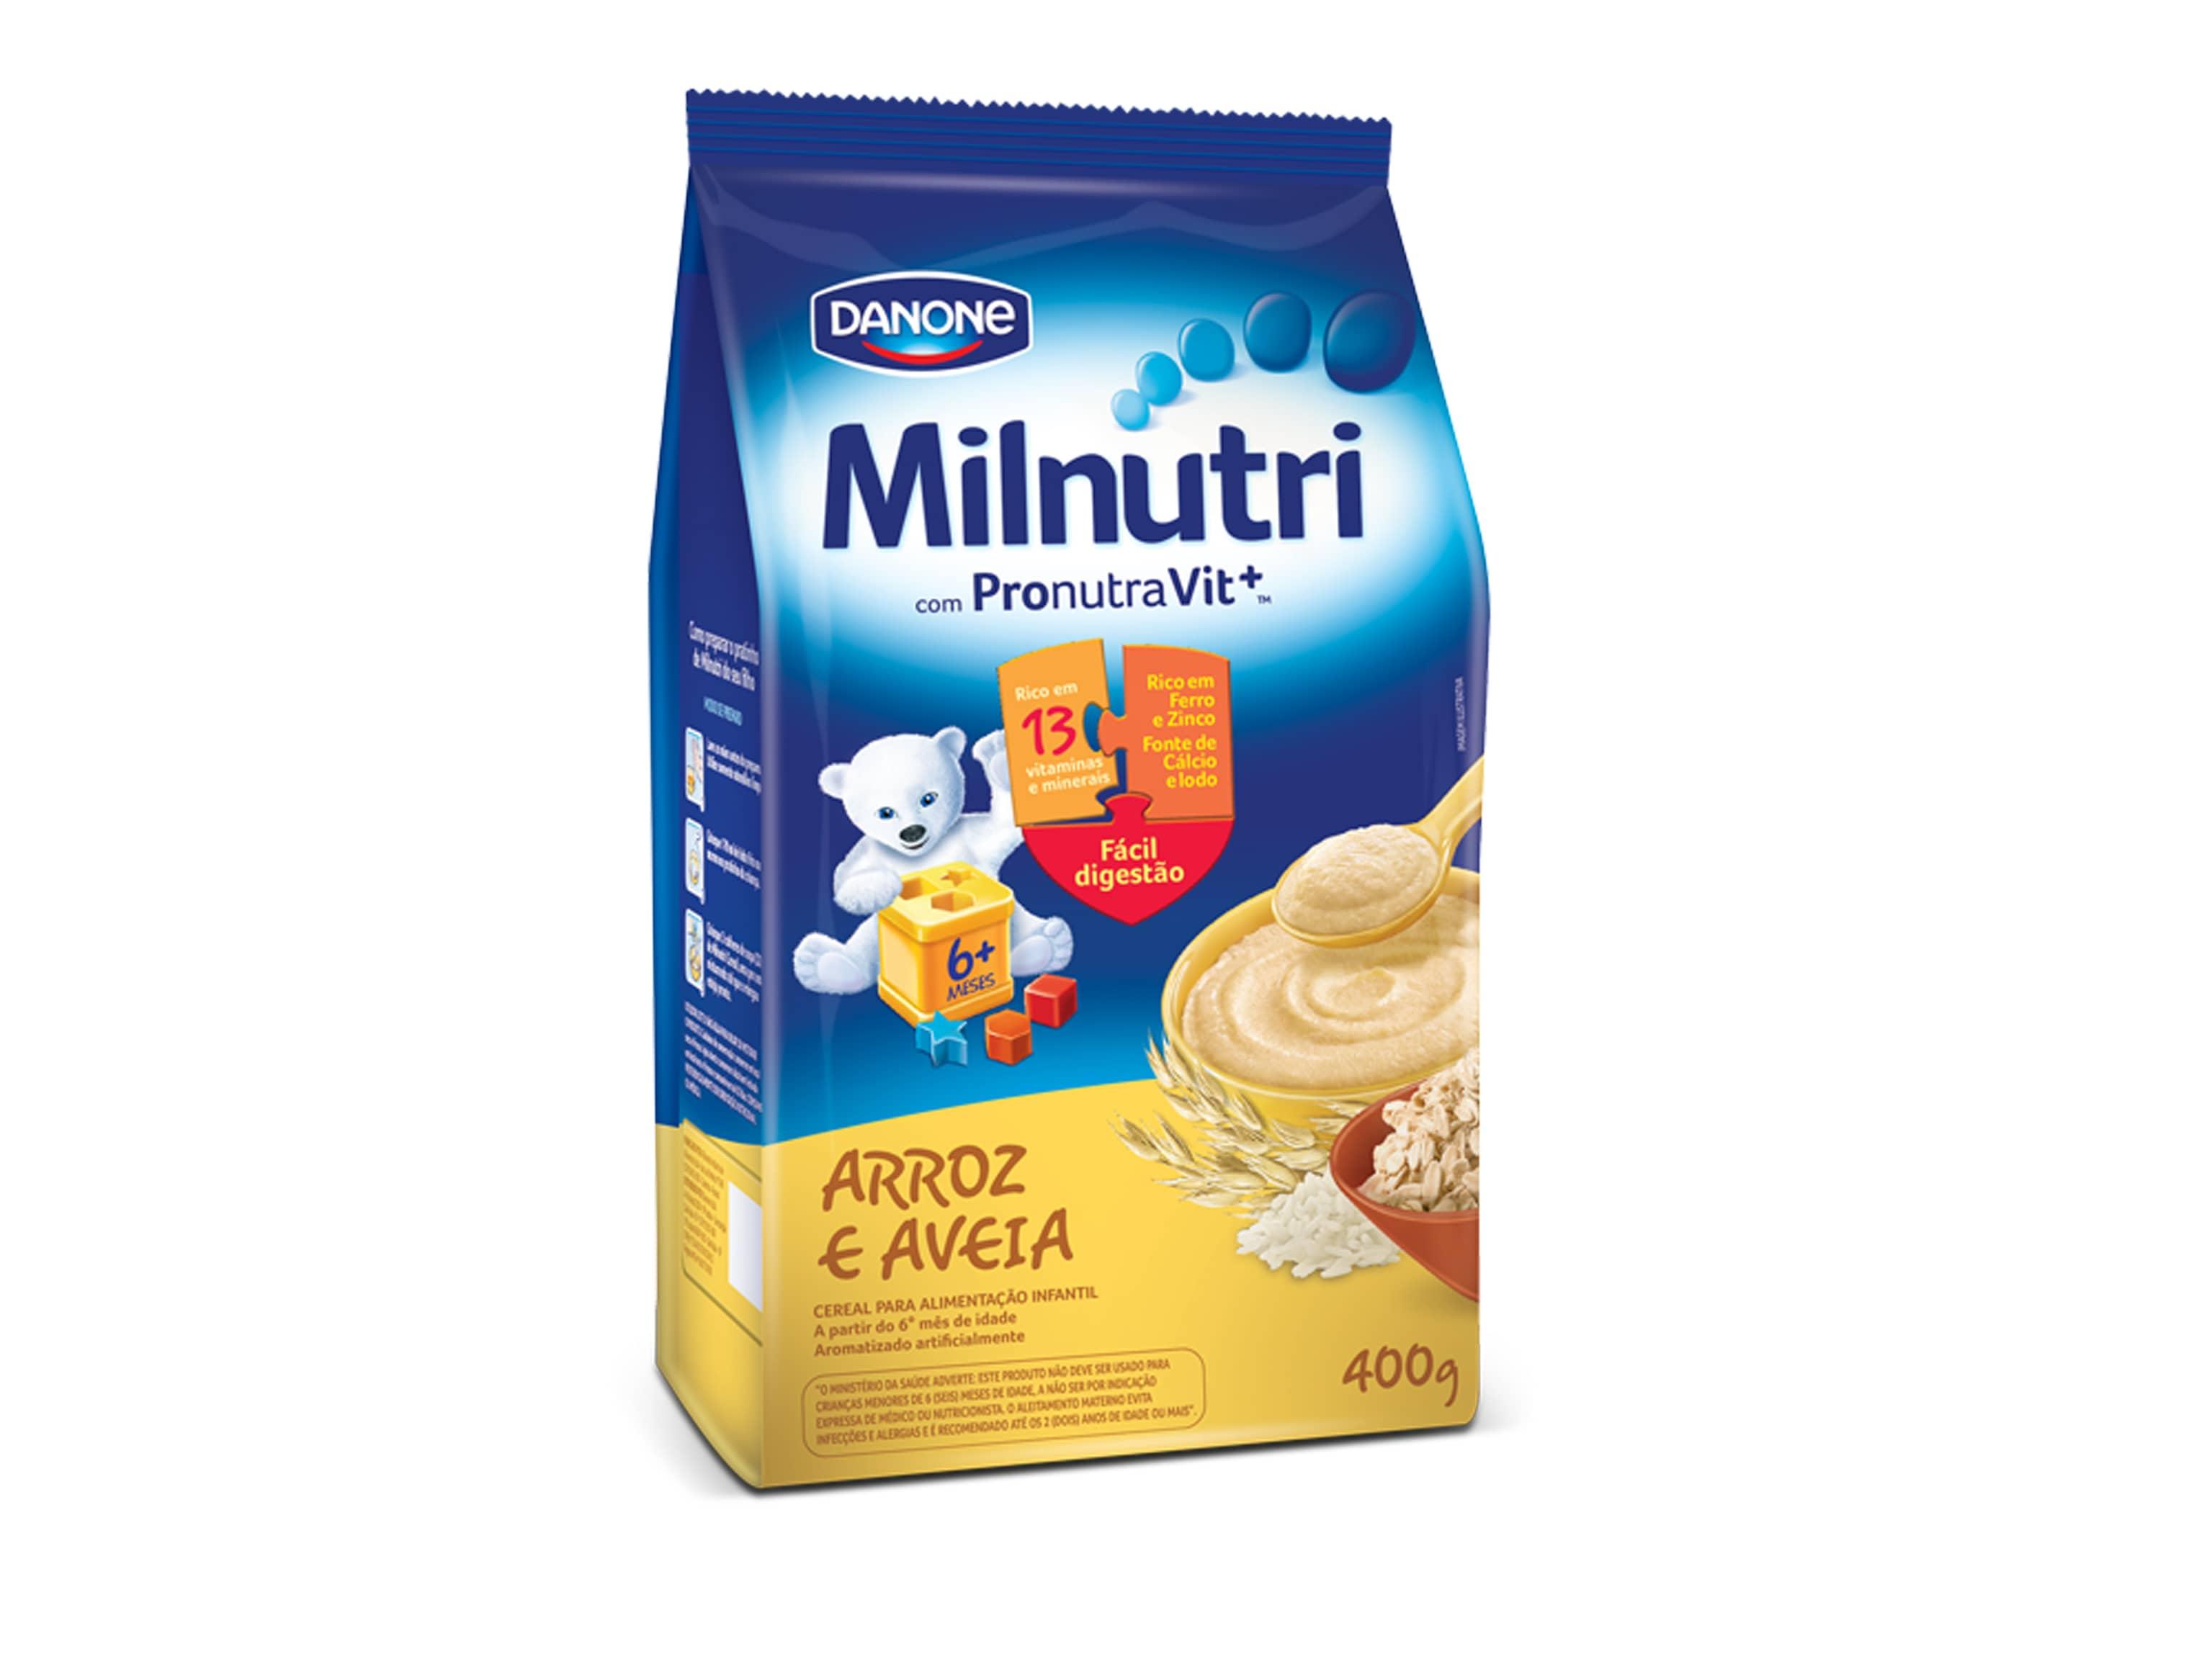 MOCKUP-MILNUTRI-ARROZ-E-AVEIA-400G